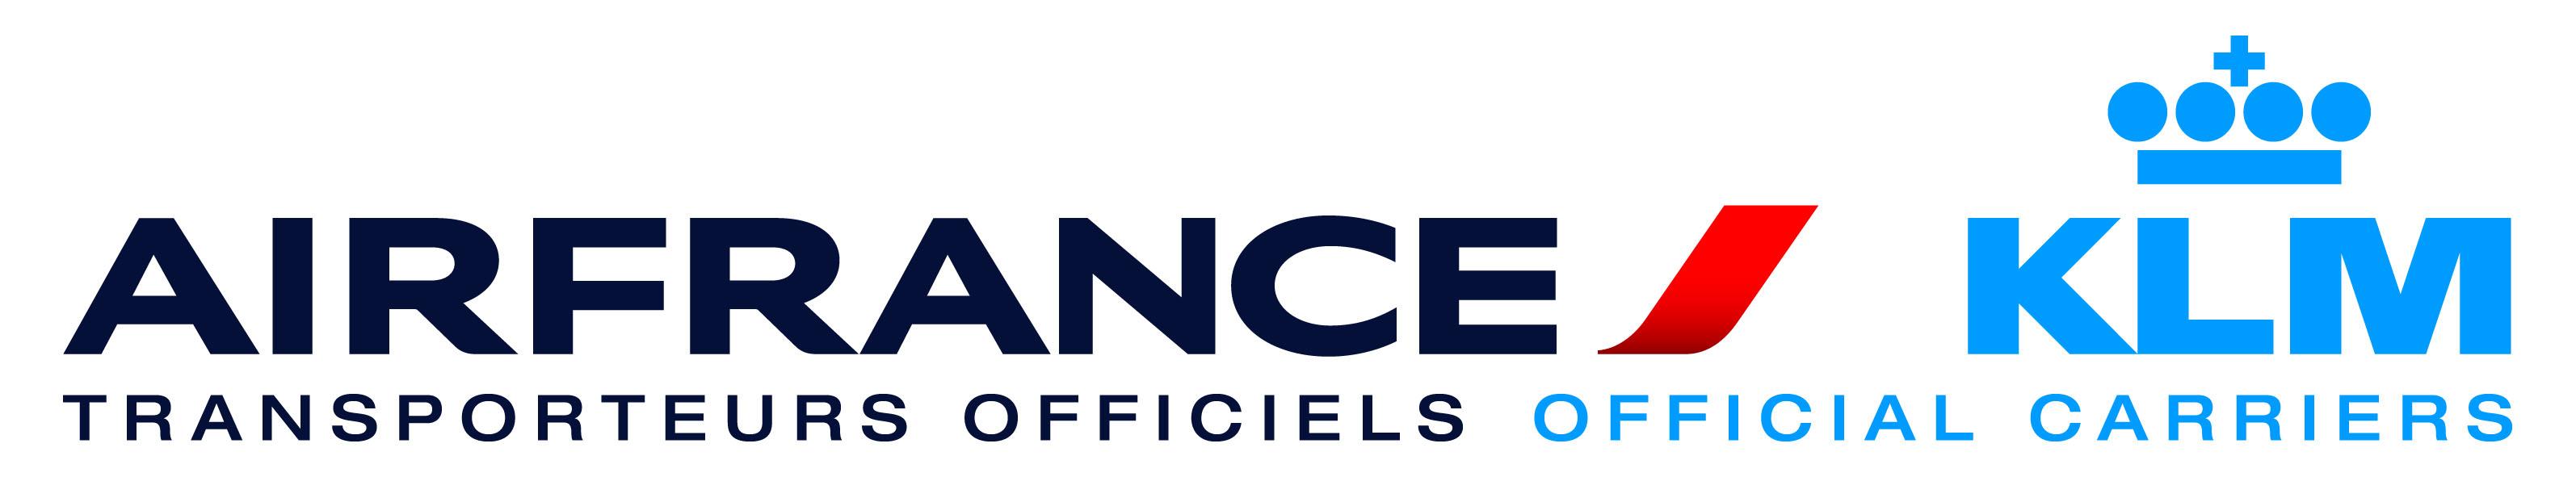 Logo Air France Klm PNG - 111257